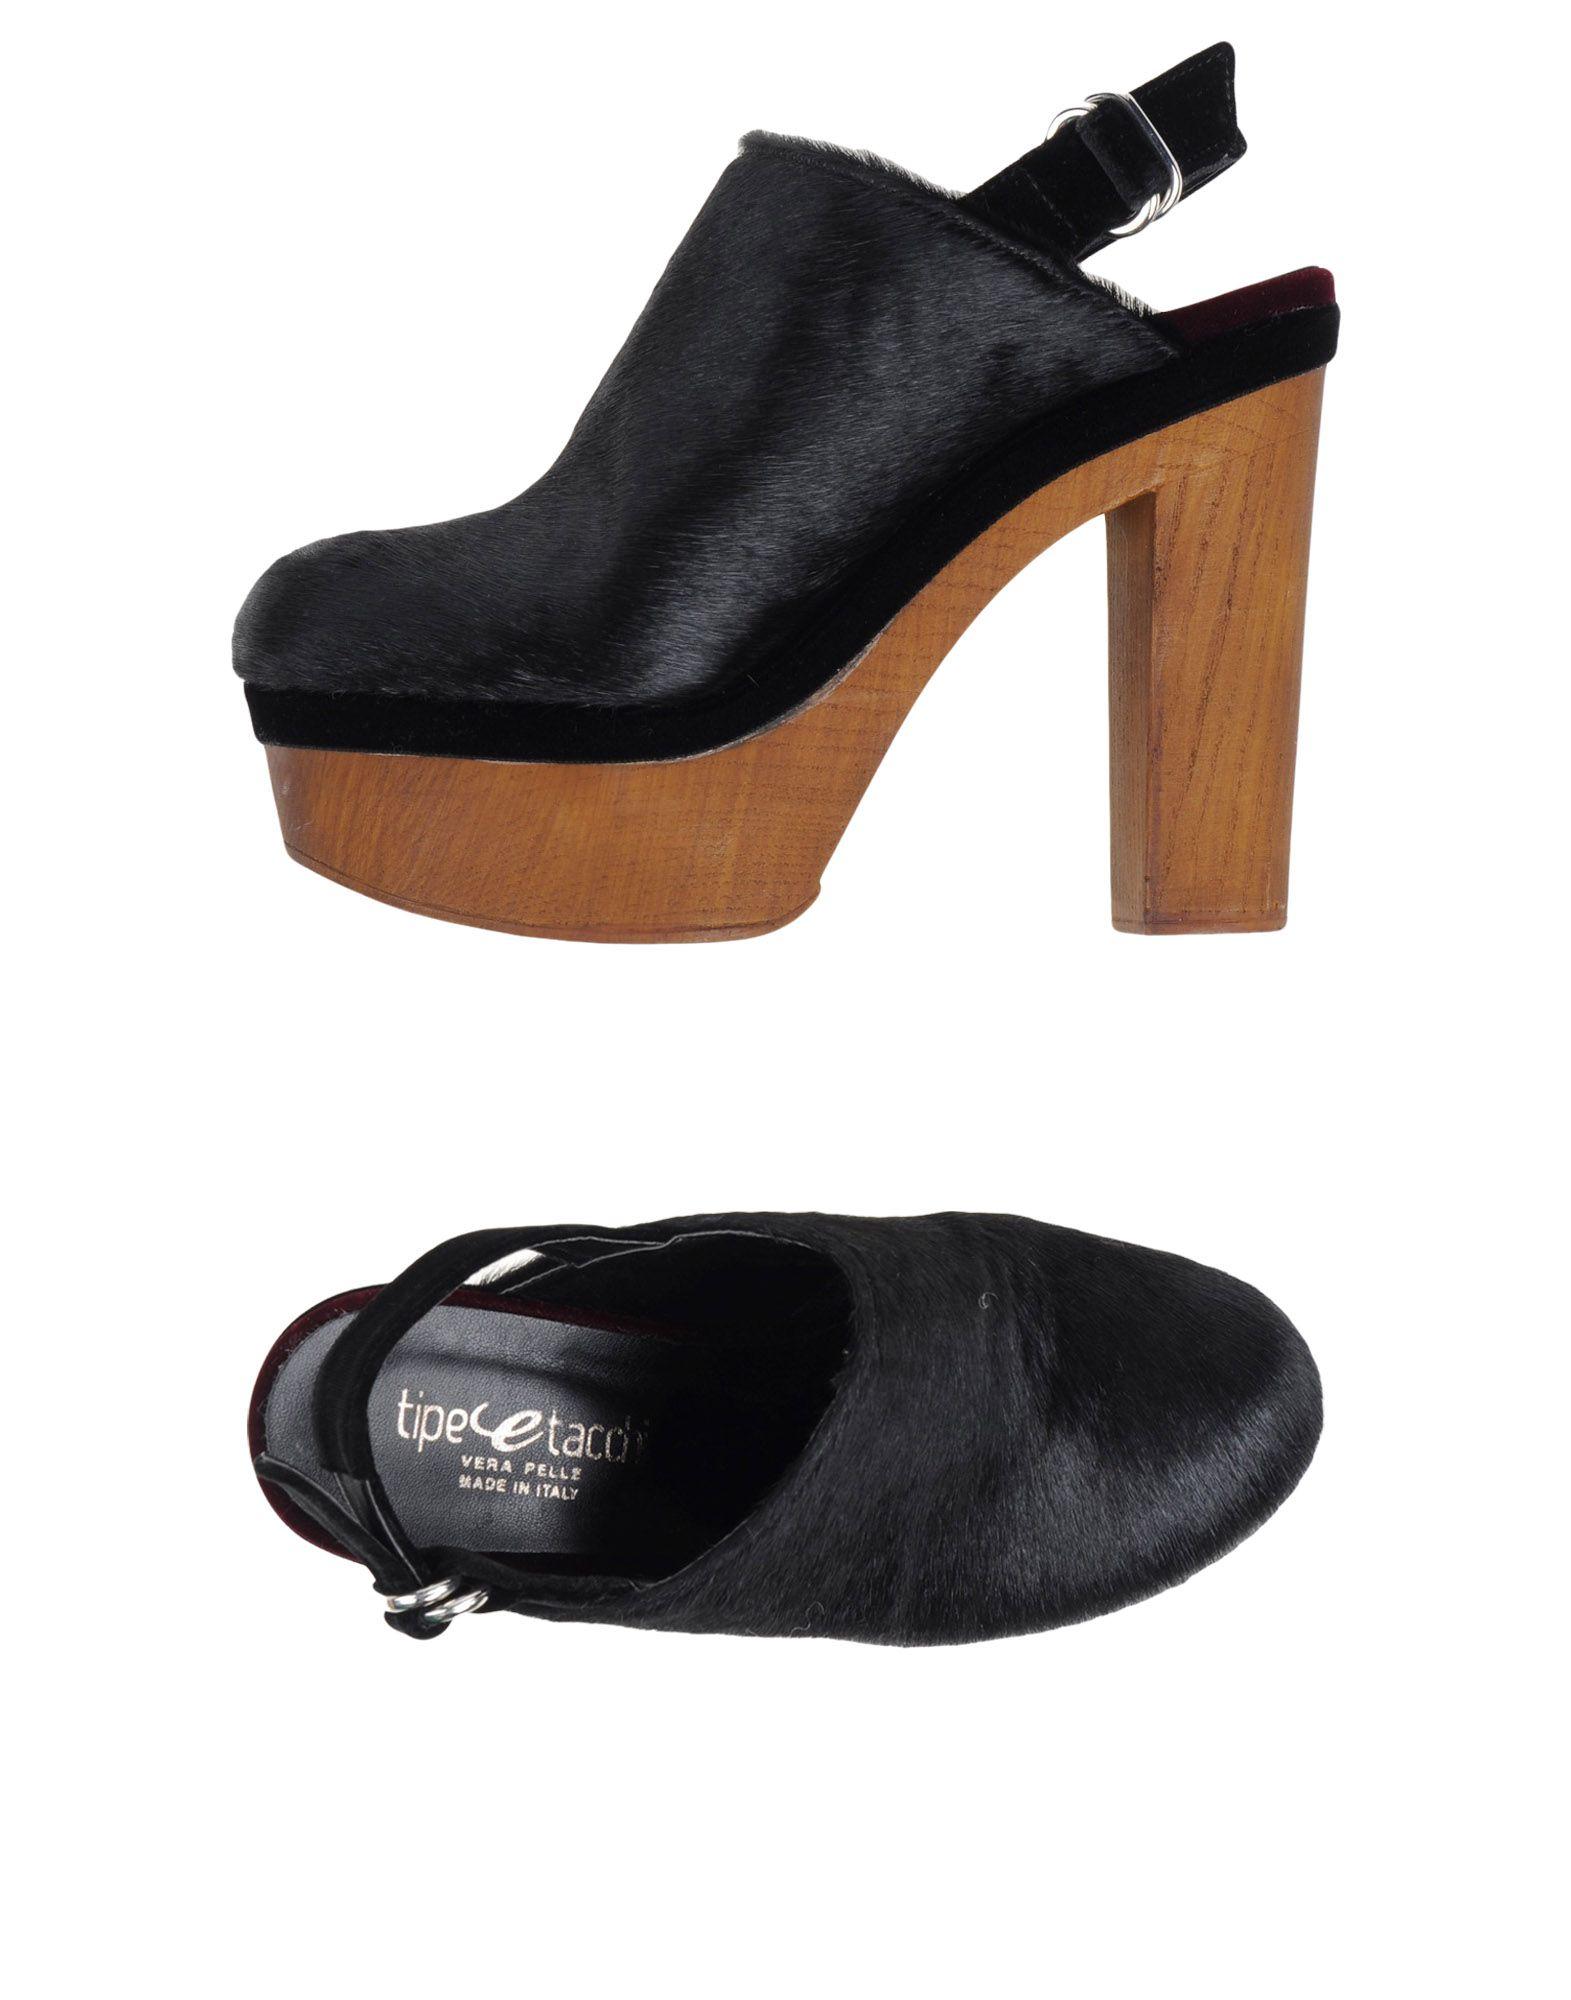 Stilvolle Tacchi billige Schuhe Tipe E Tacchi Stilvolle Pantoletten Damen  11014809OR c21d18